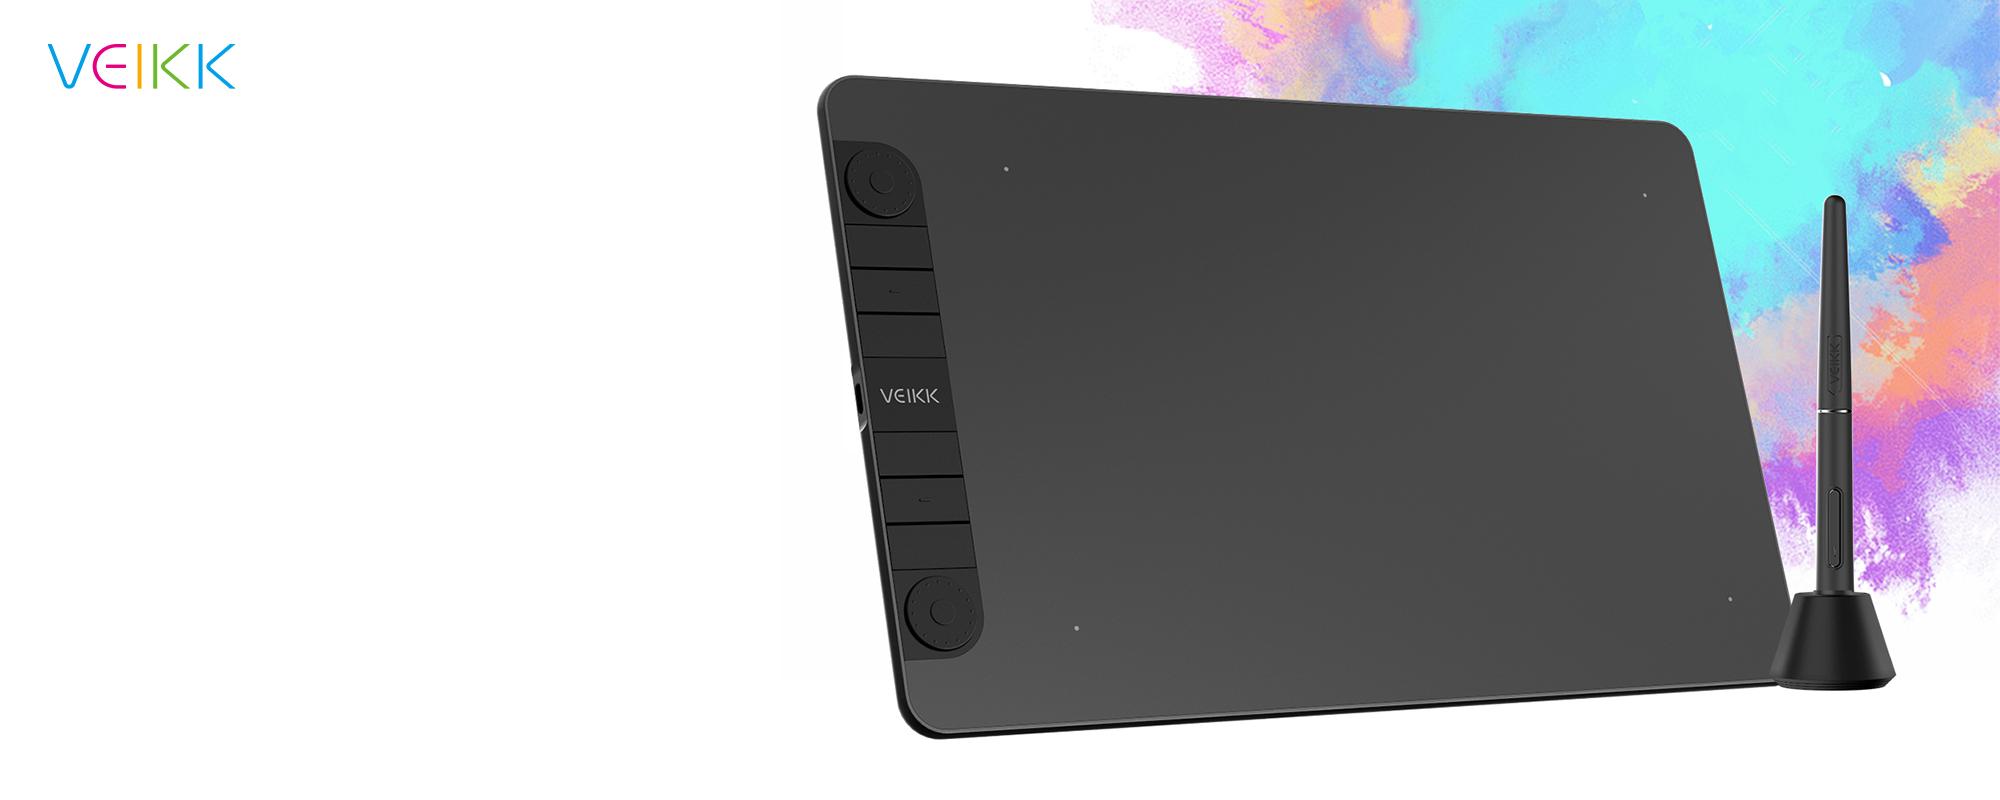 Veikk VK1060 Pro Graphics Tablet